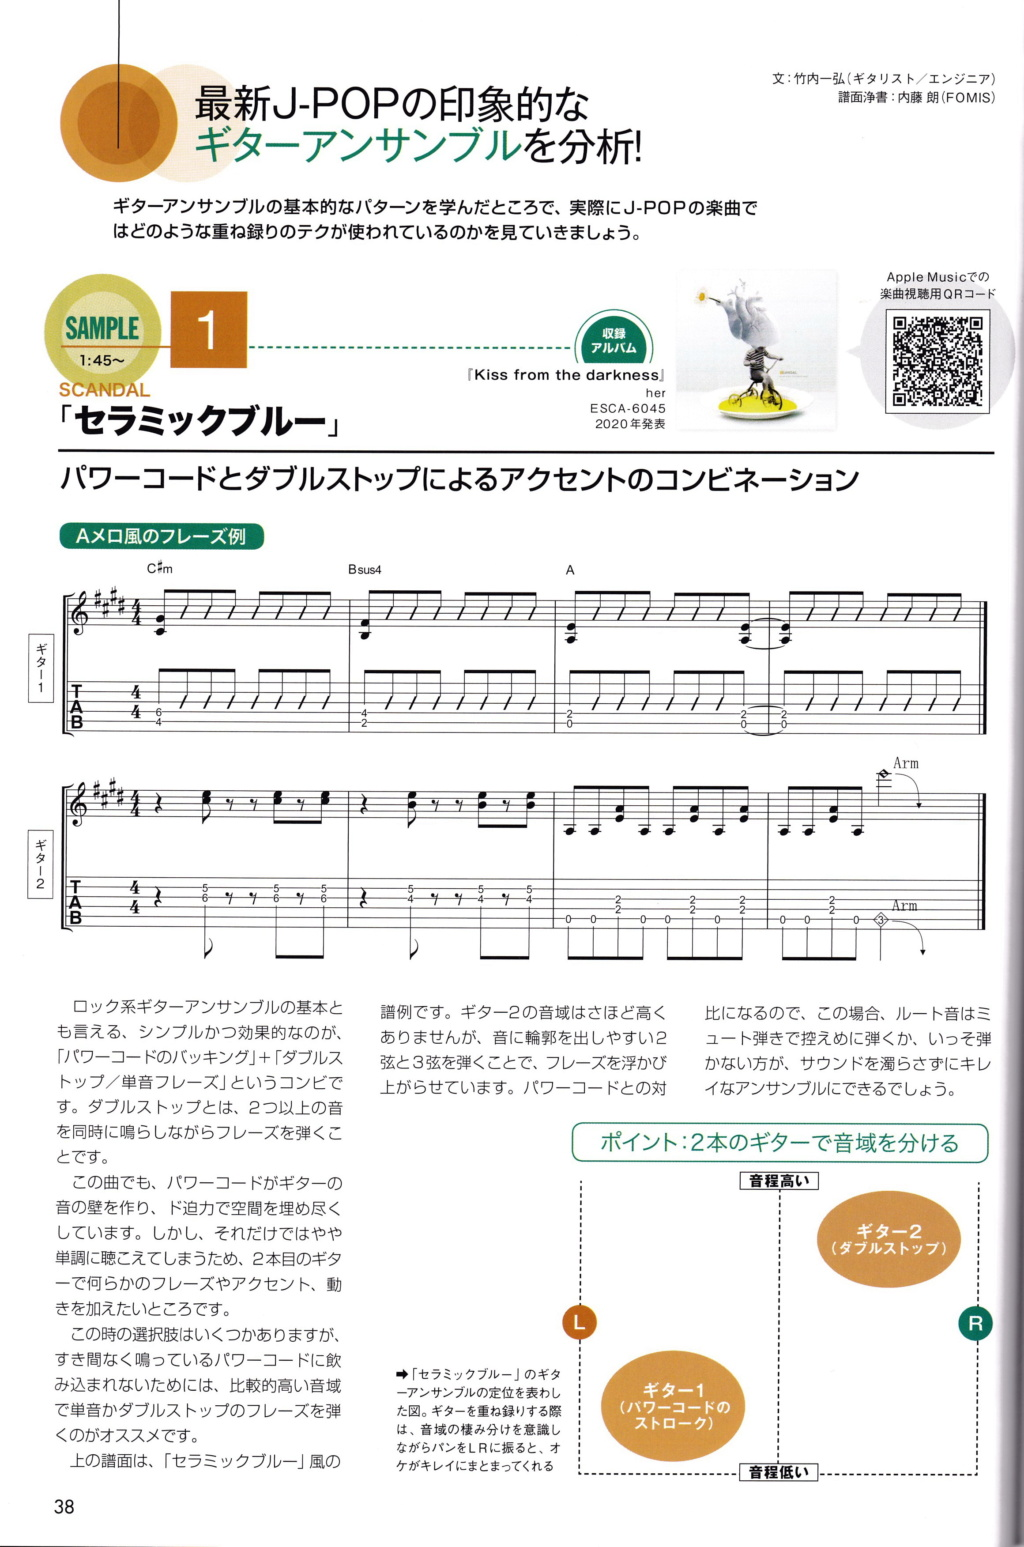 SOUND DESIGNER Img_0051